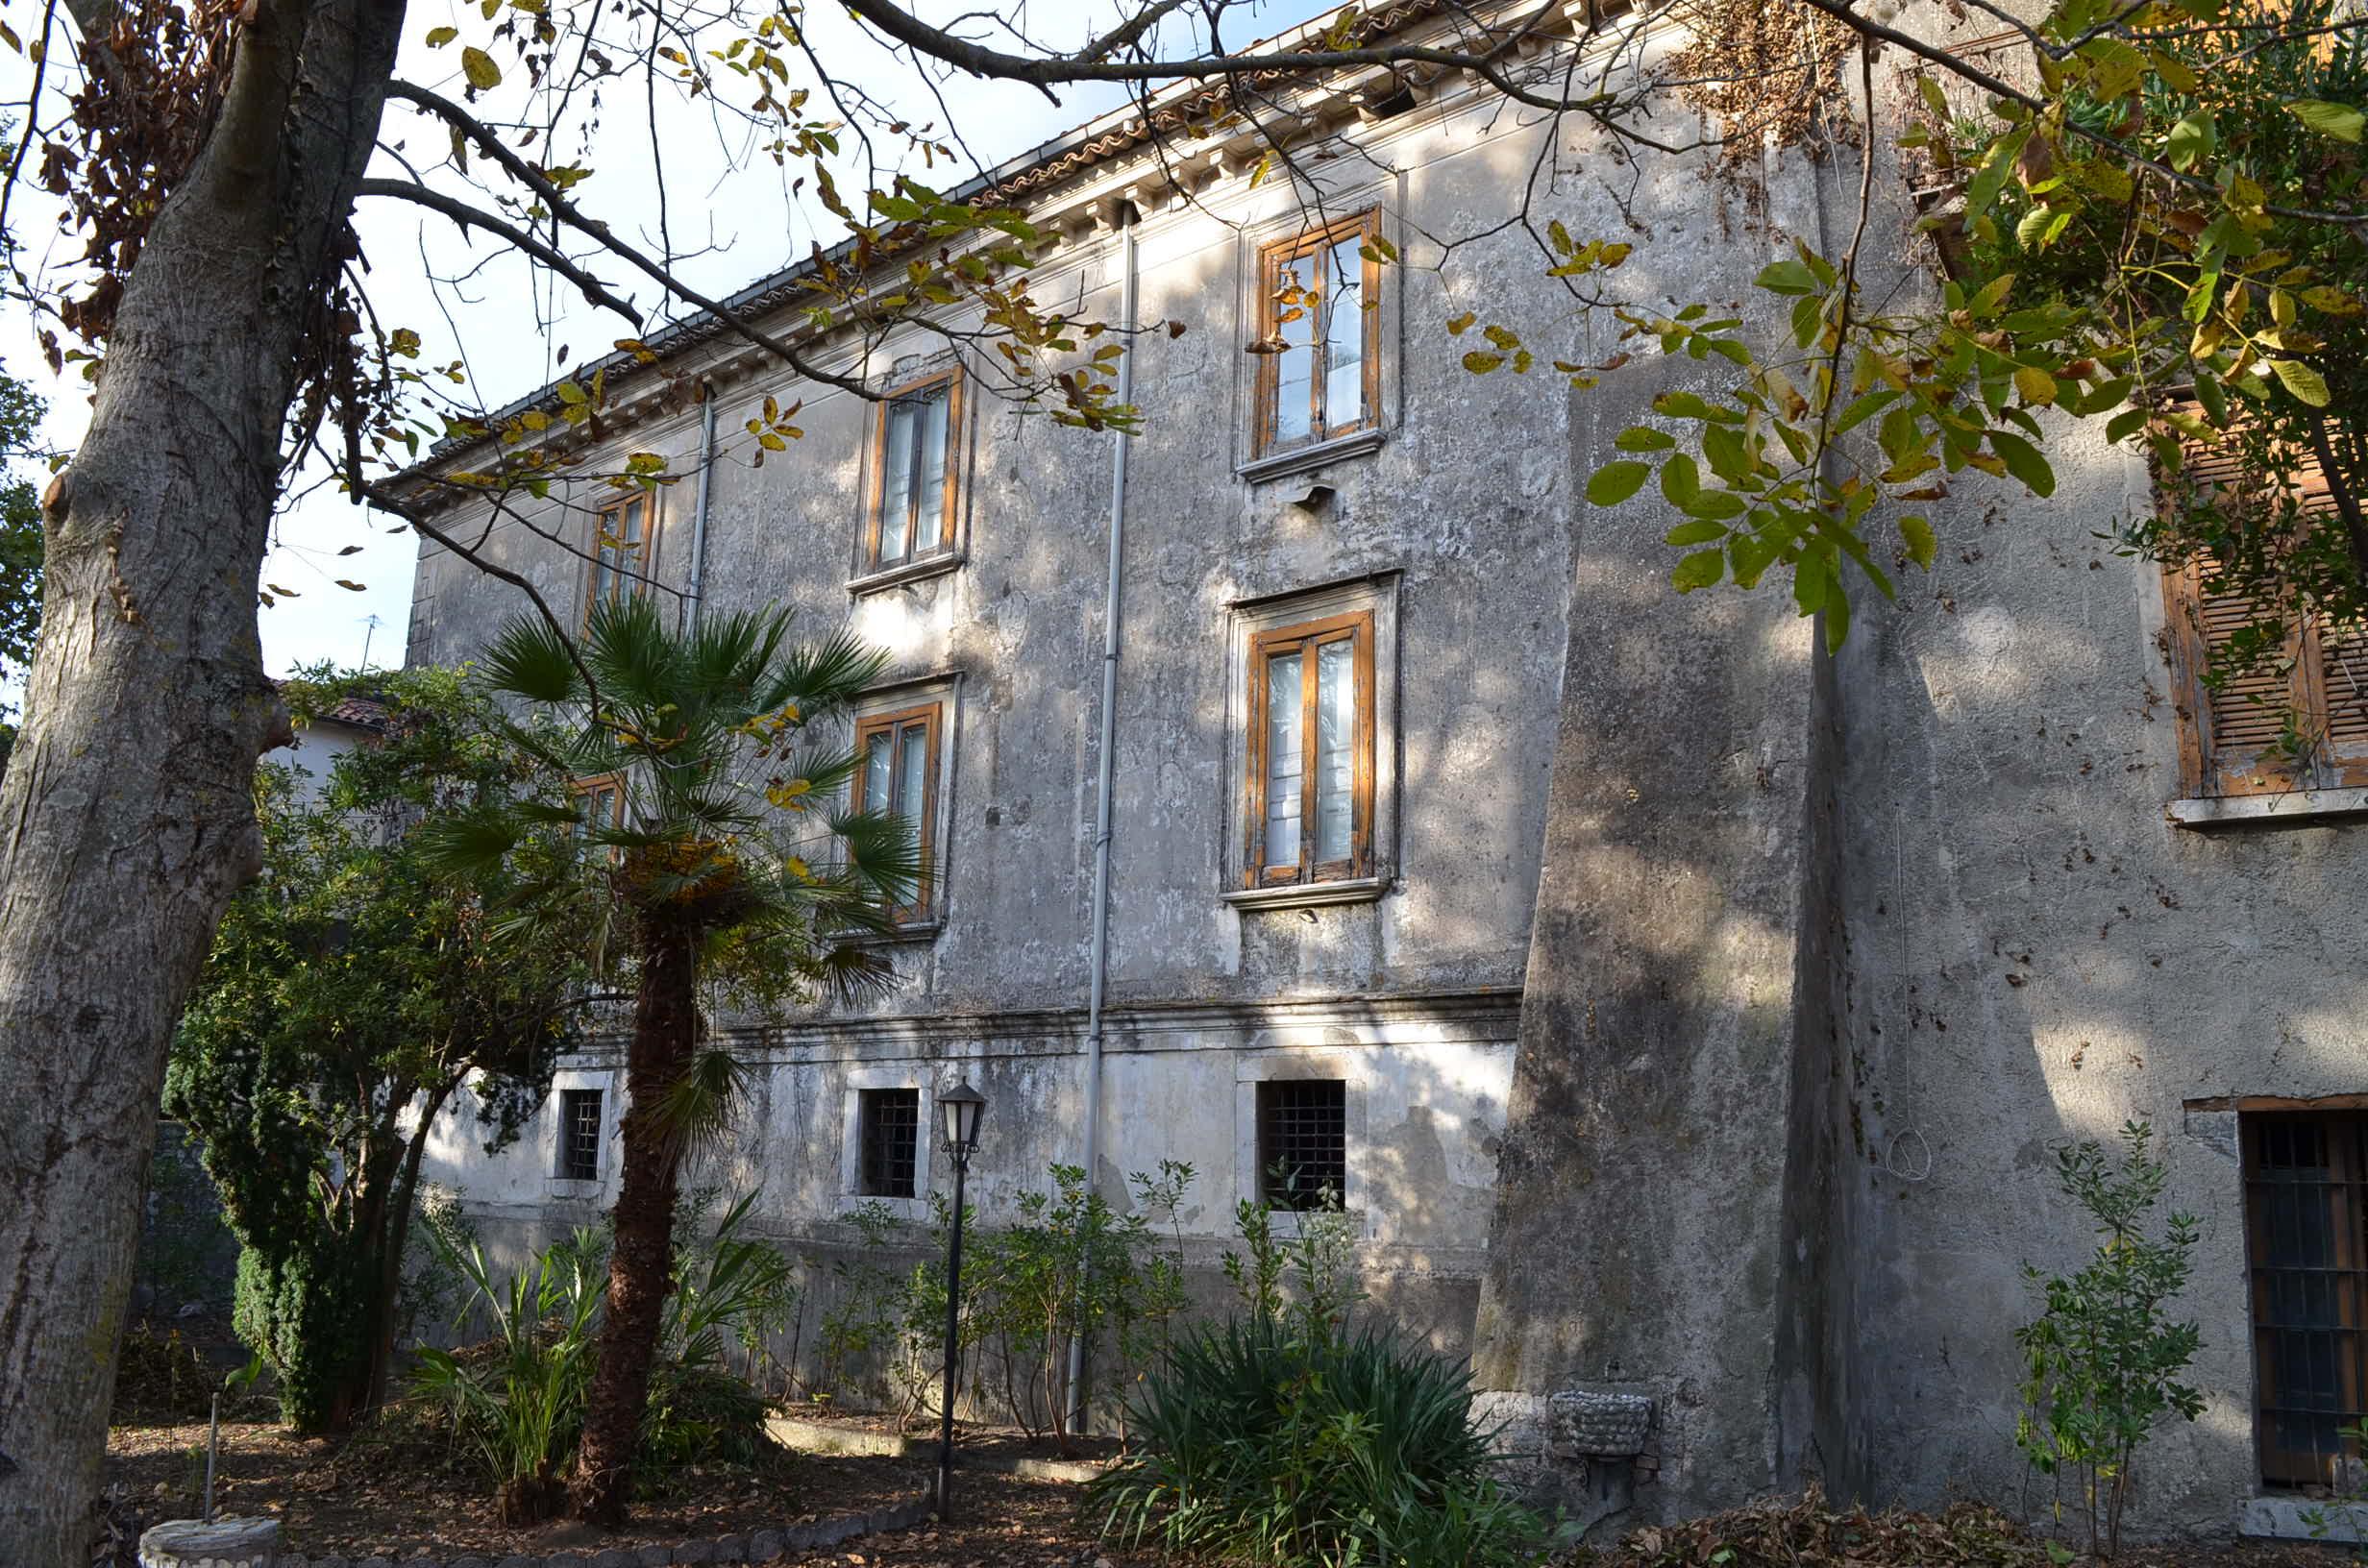 Forino (AV) Palazzo storico con giardino